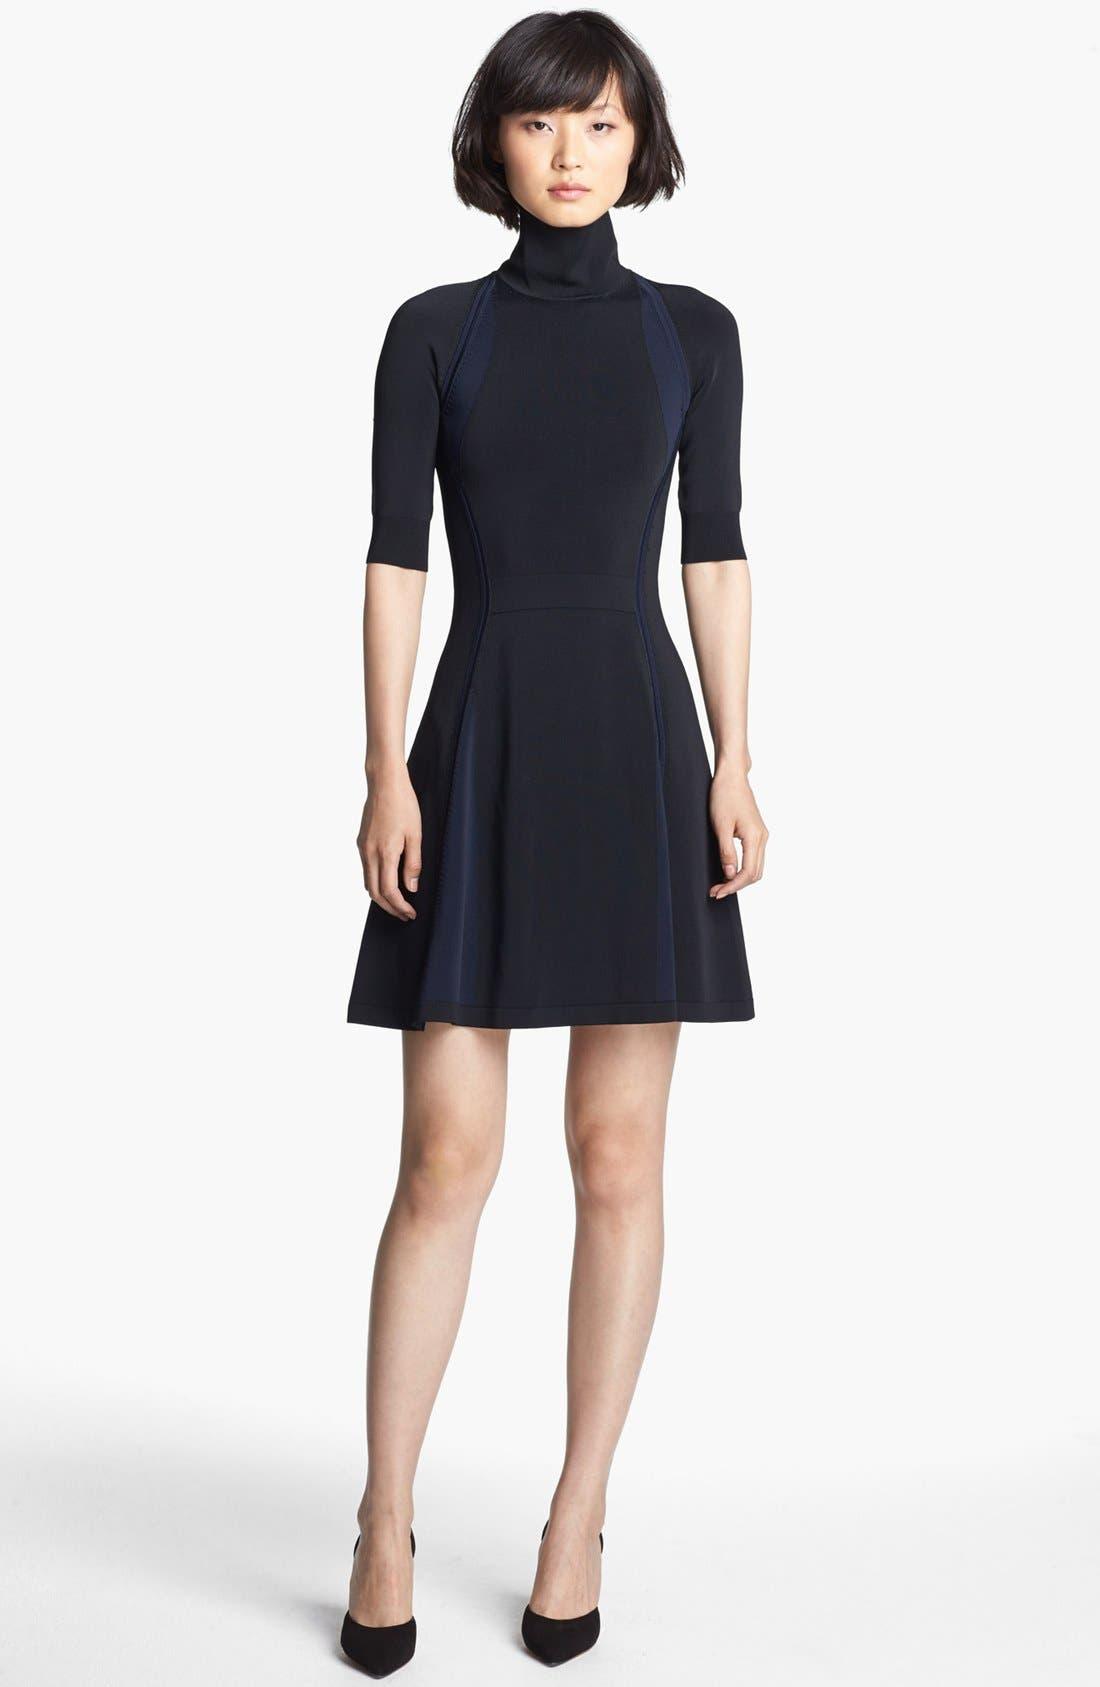 Alternate Image 1 Selected - A.L.C. 'Manivet' Dress